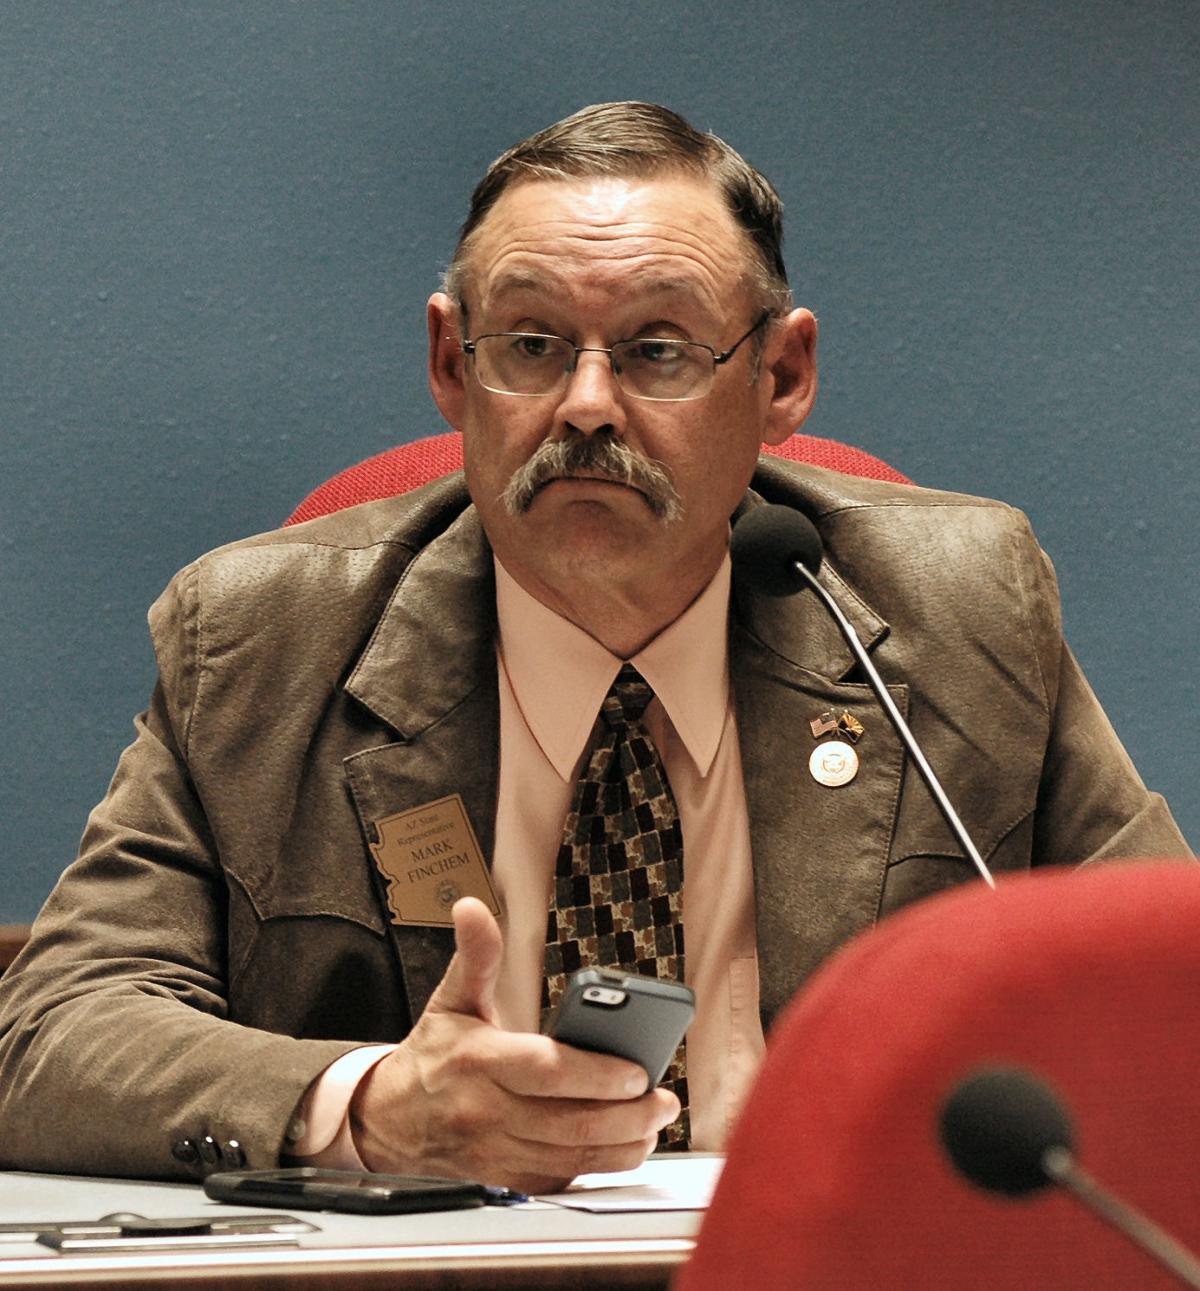 State Rep. Mark Finchem